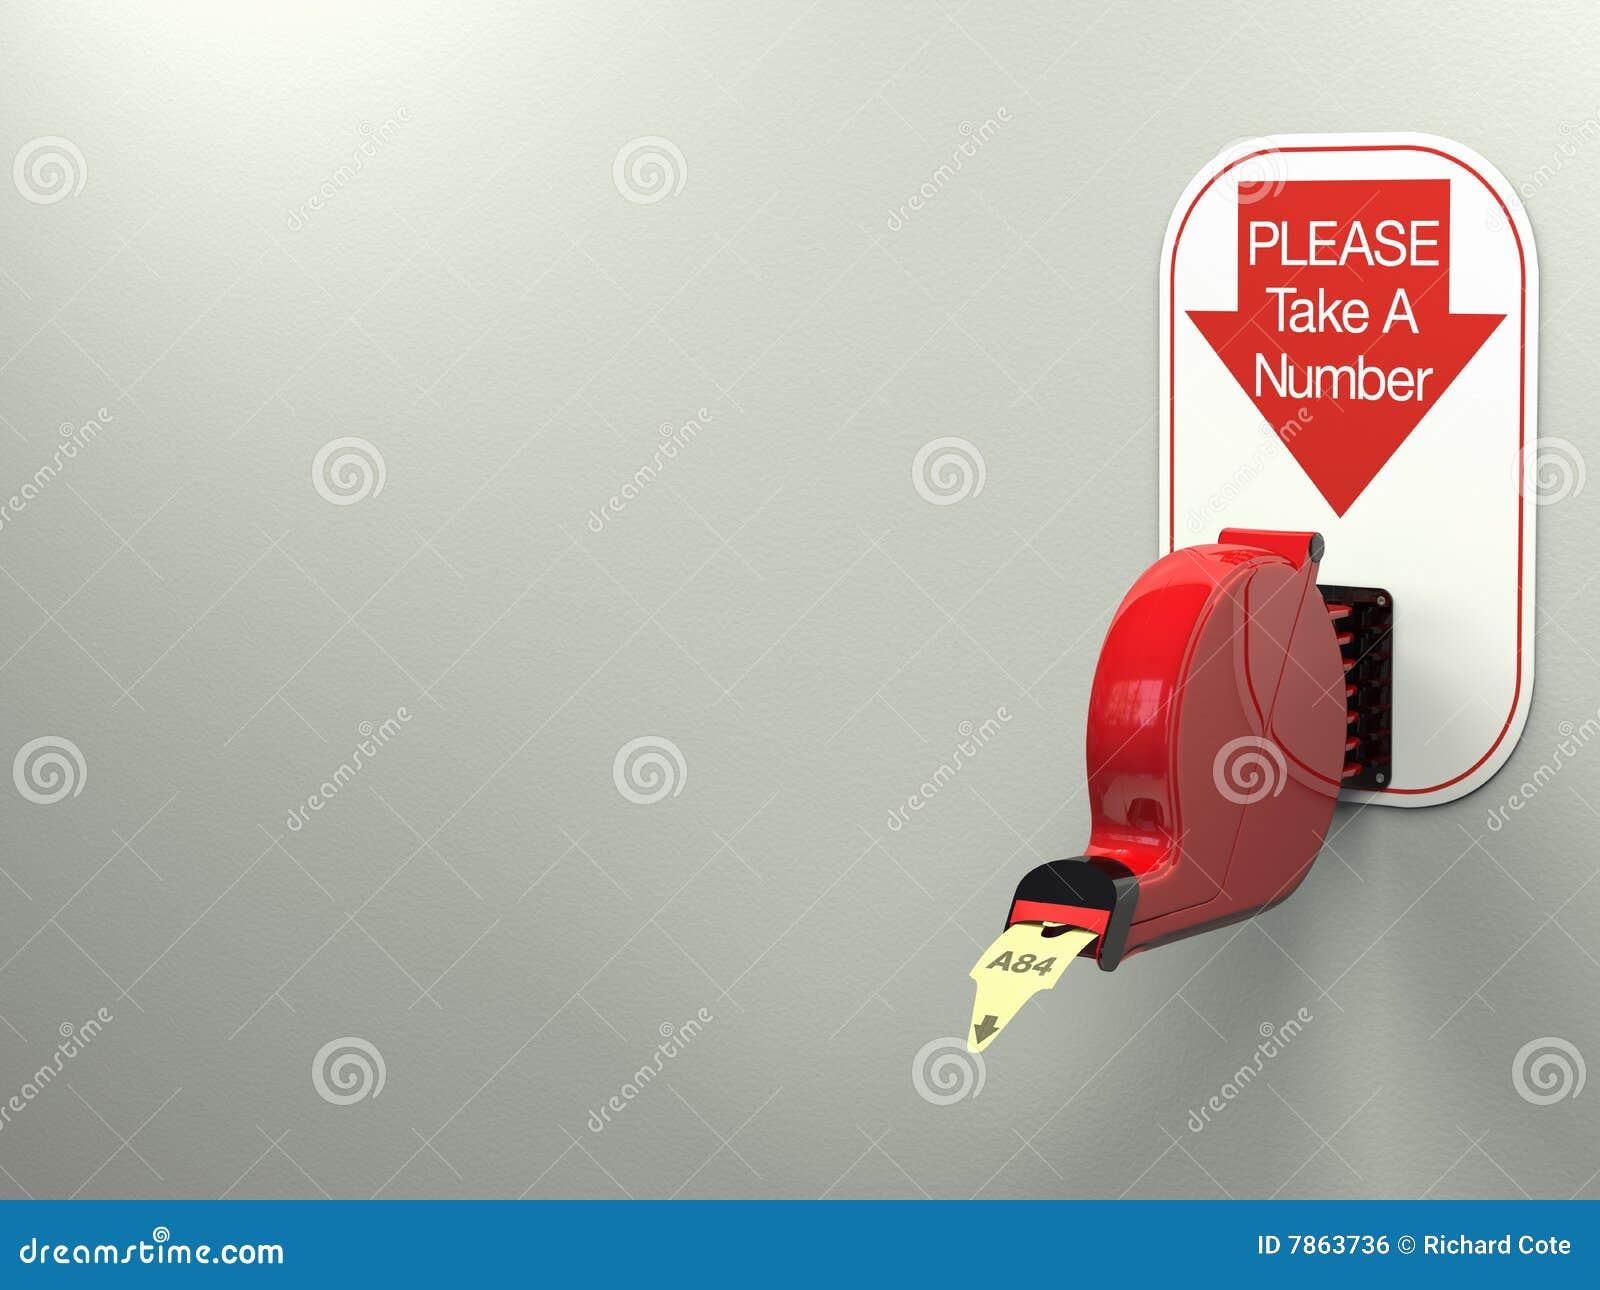 ticket dispenser royalty free stock image image 7863736